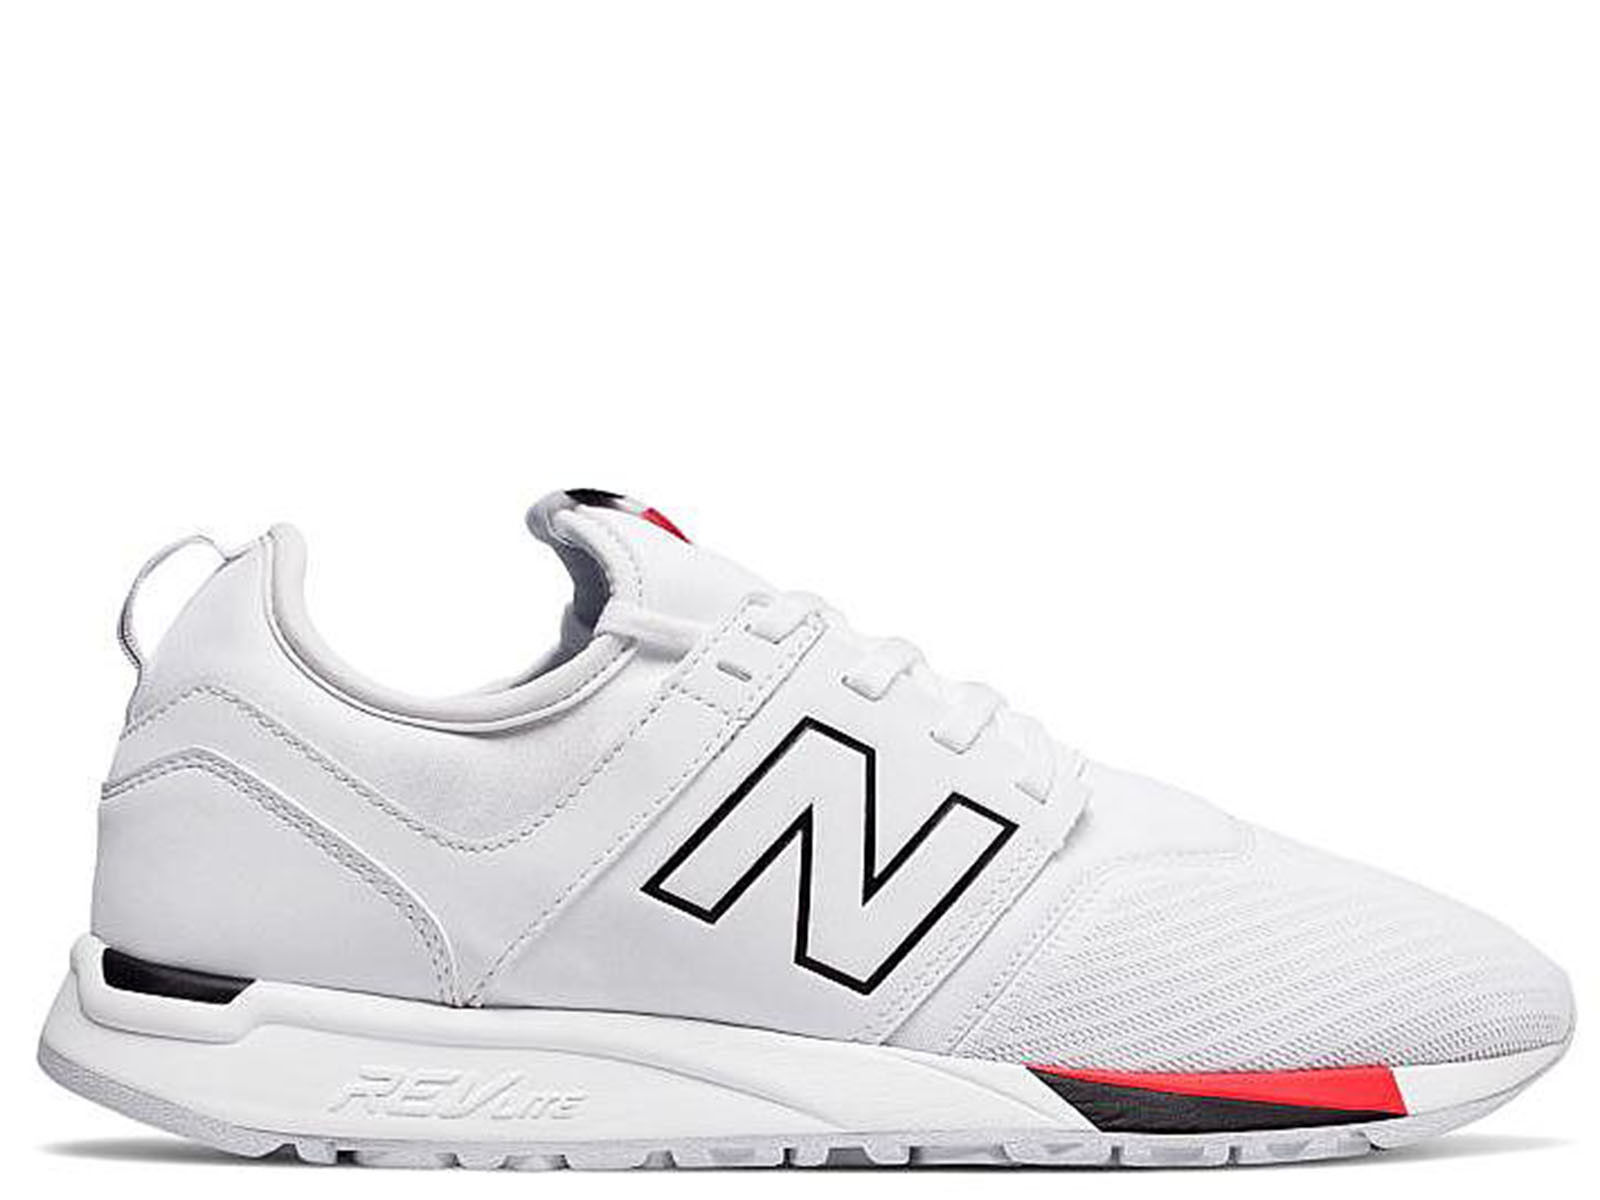 Men's Brand New New Balance Lifestyle  Mode De Vie  Athletic Sneakers [MRL247WR]